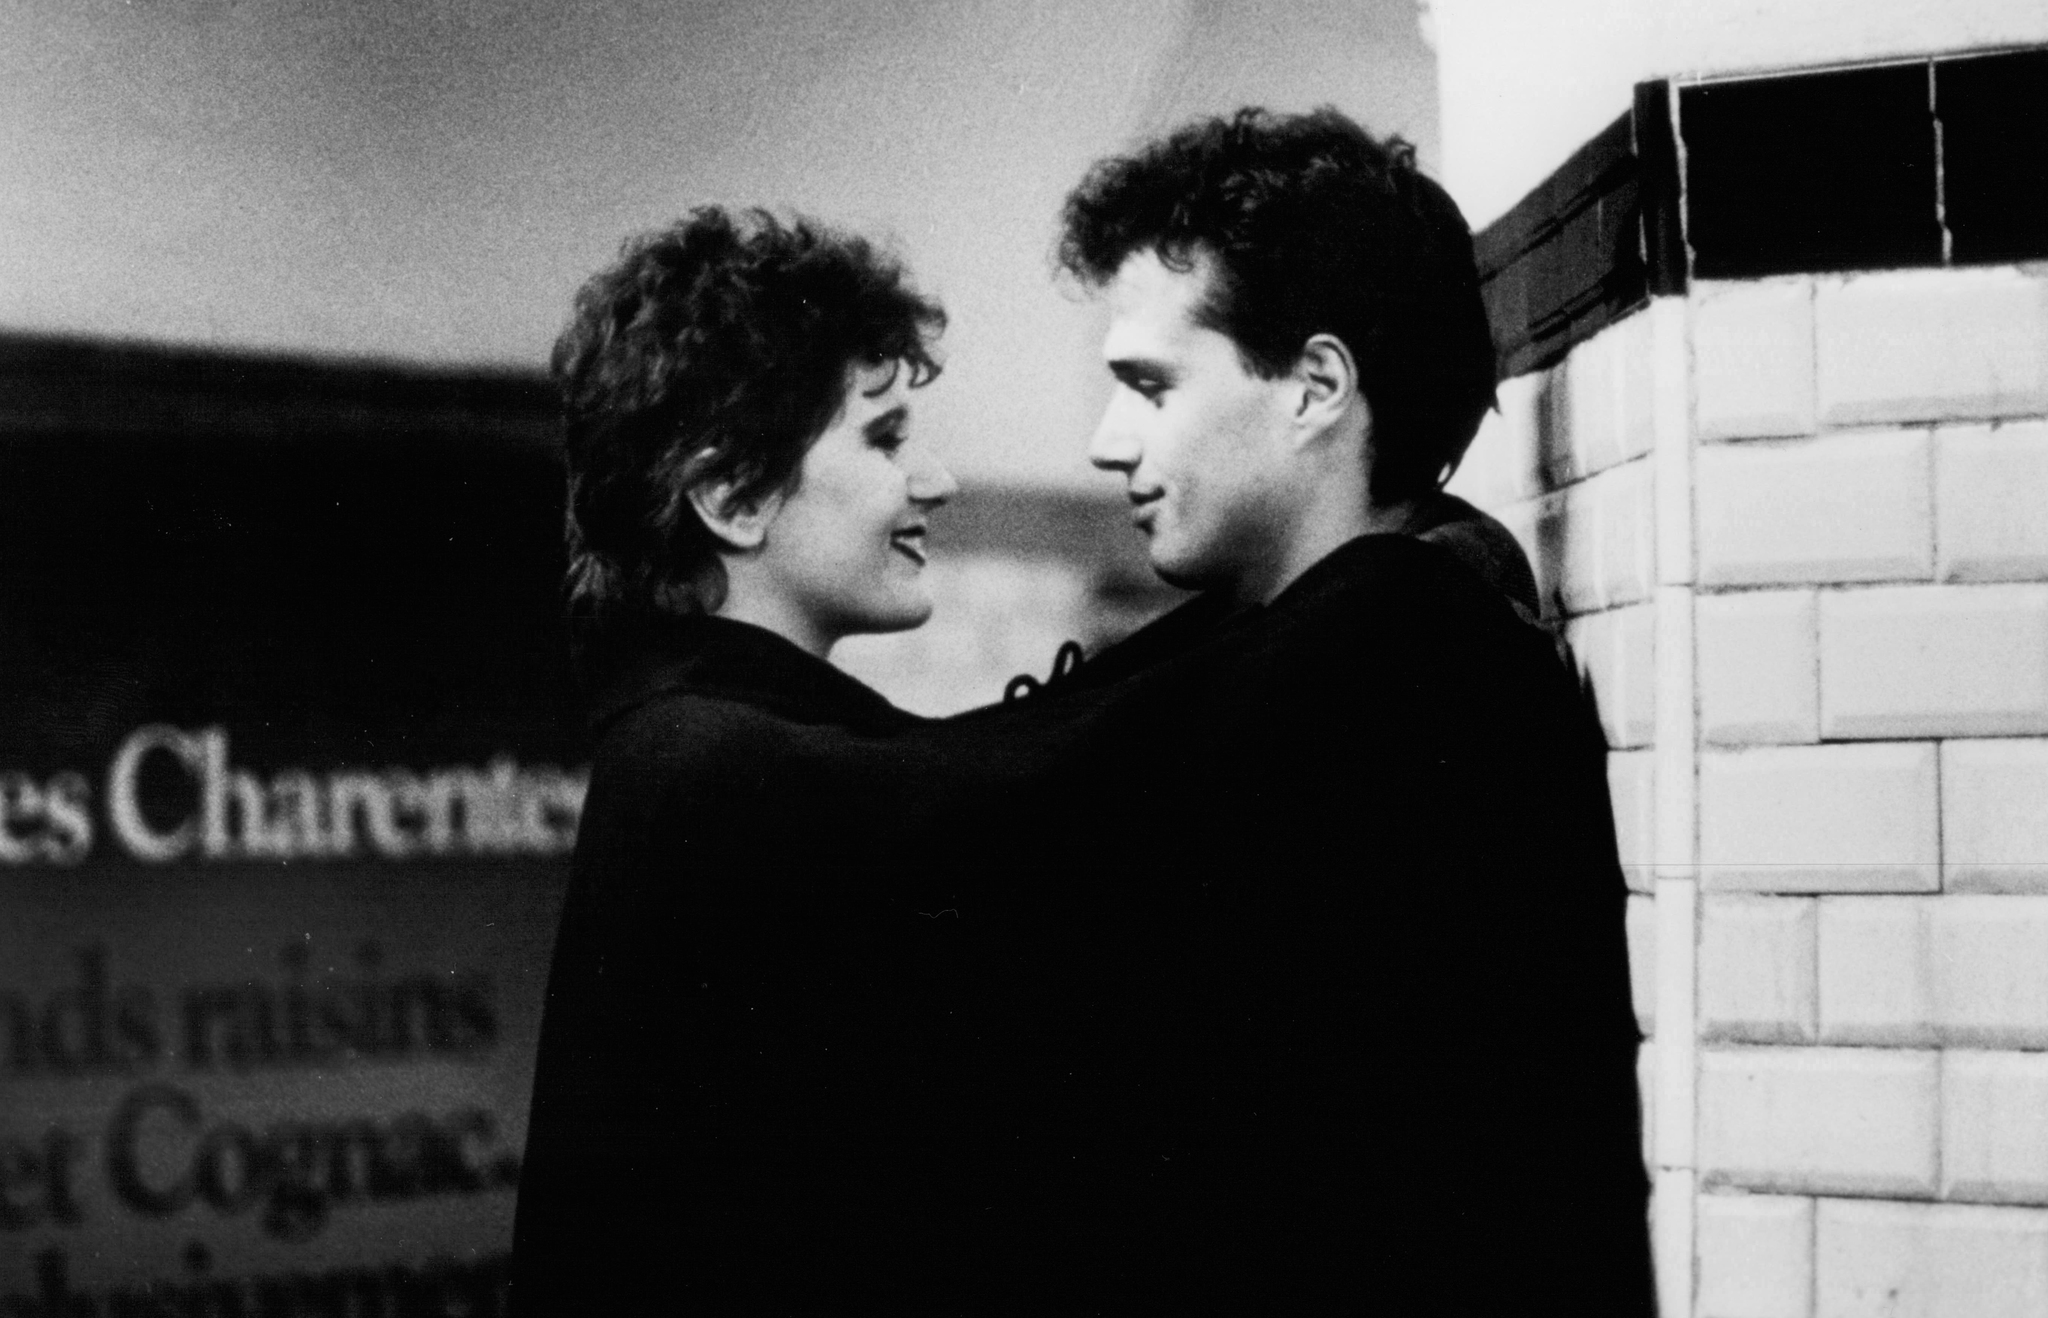 Aurore Clément and Laurent Malet in Invitation au voyage (1982)